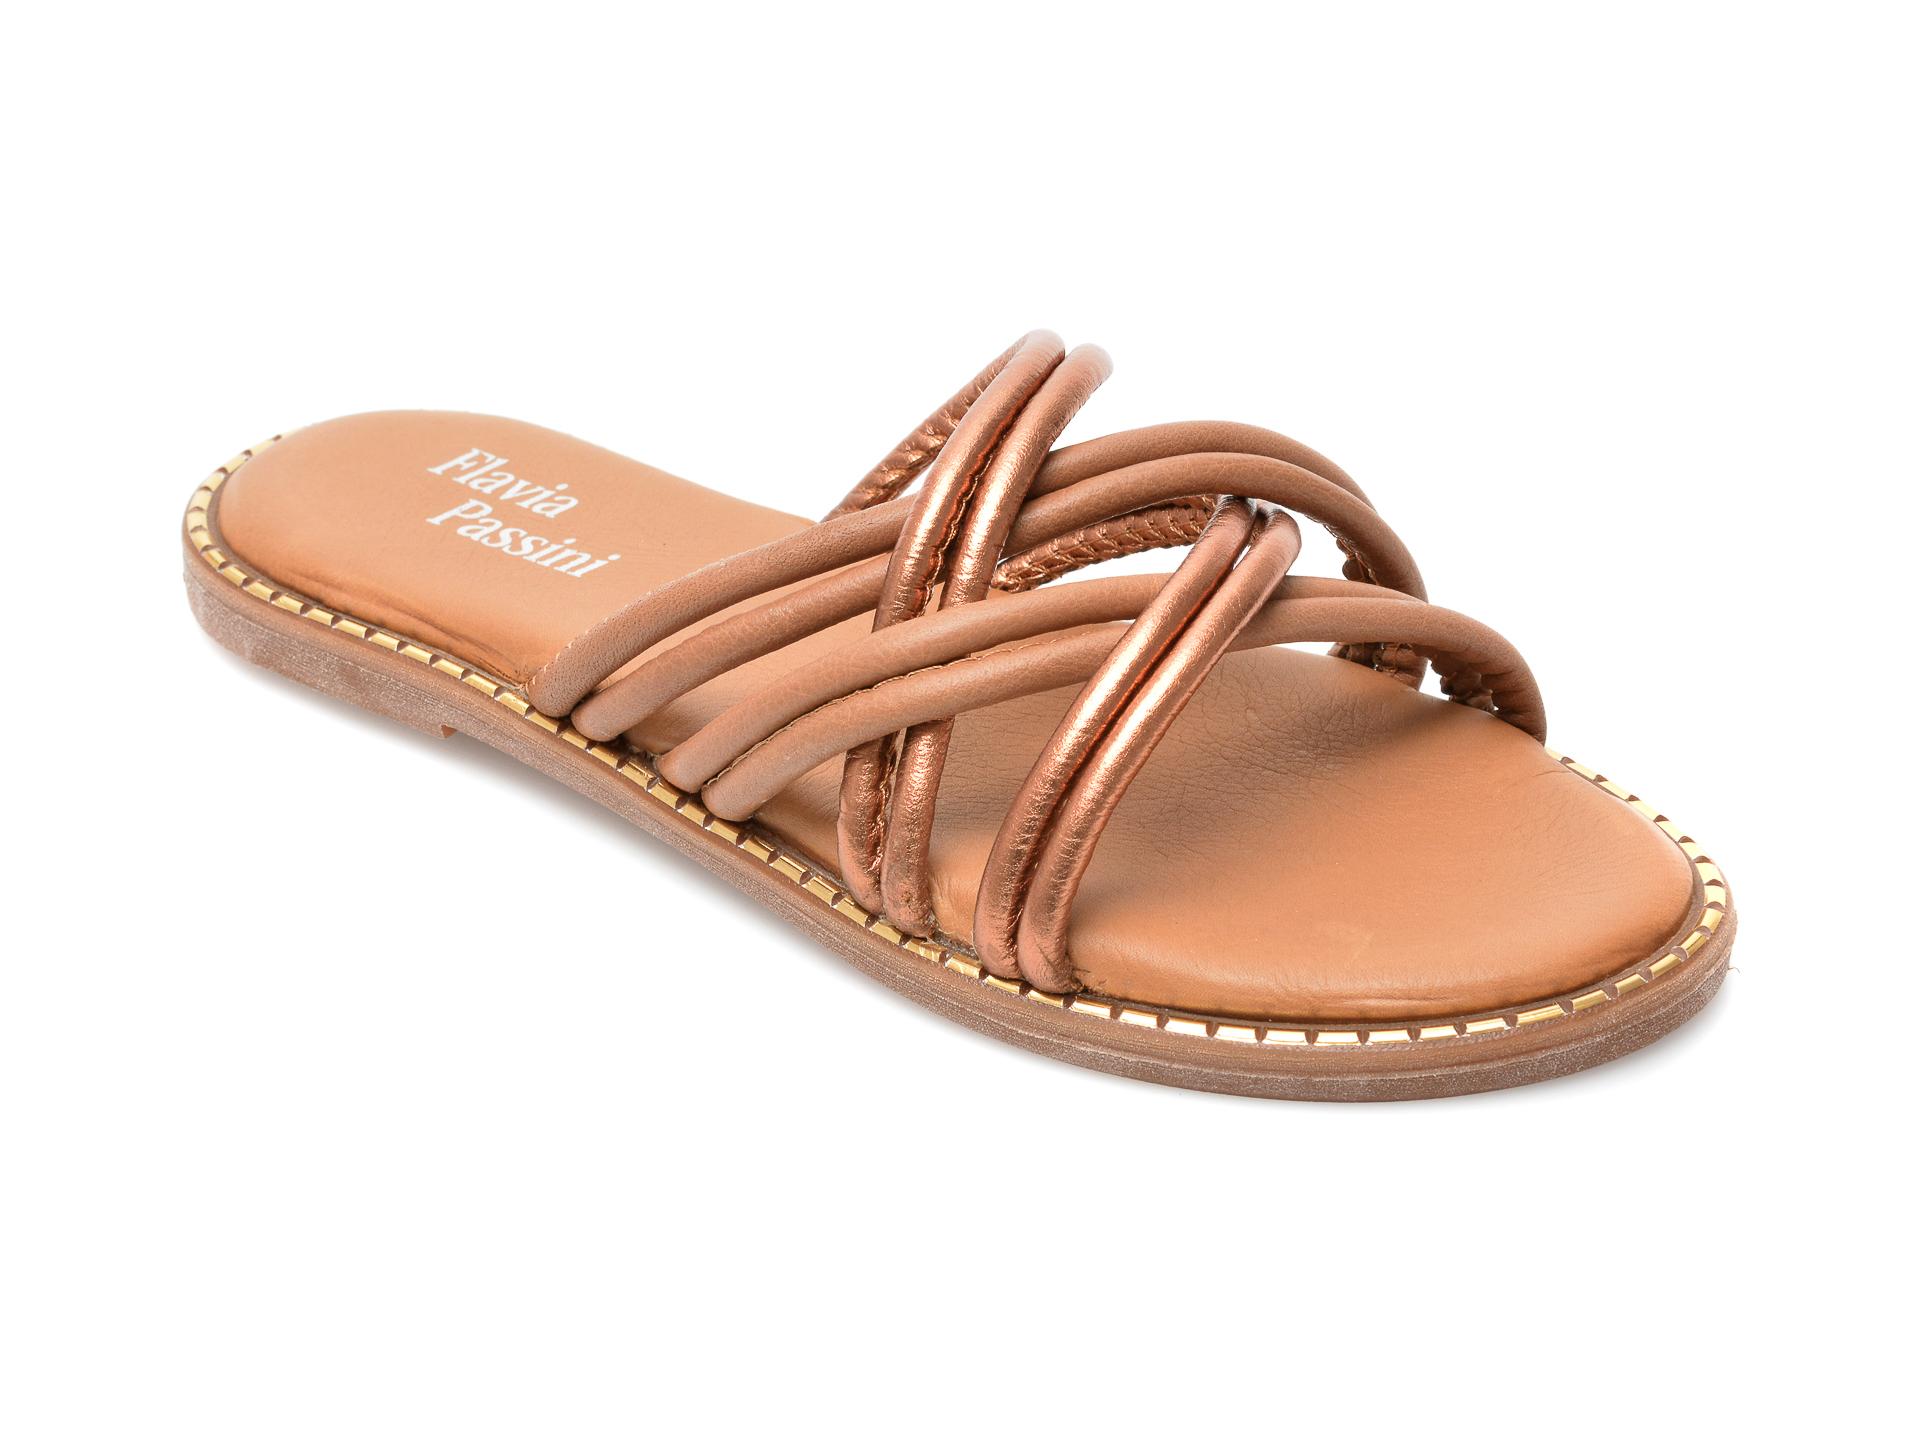 Papuci FLAVIA PASSINI maro, 3098, din piele naturala imagine otter.ro 2021